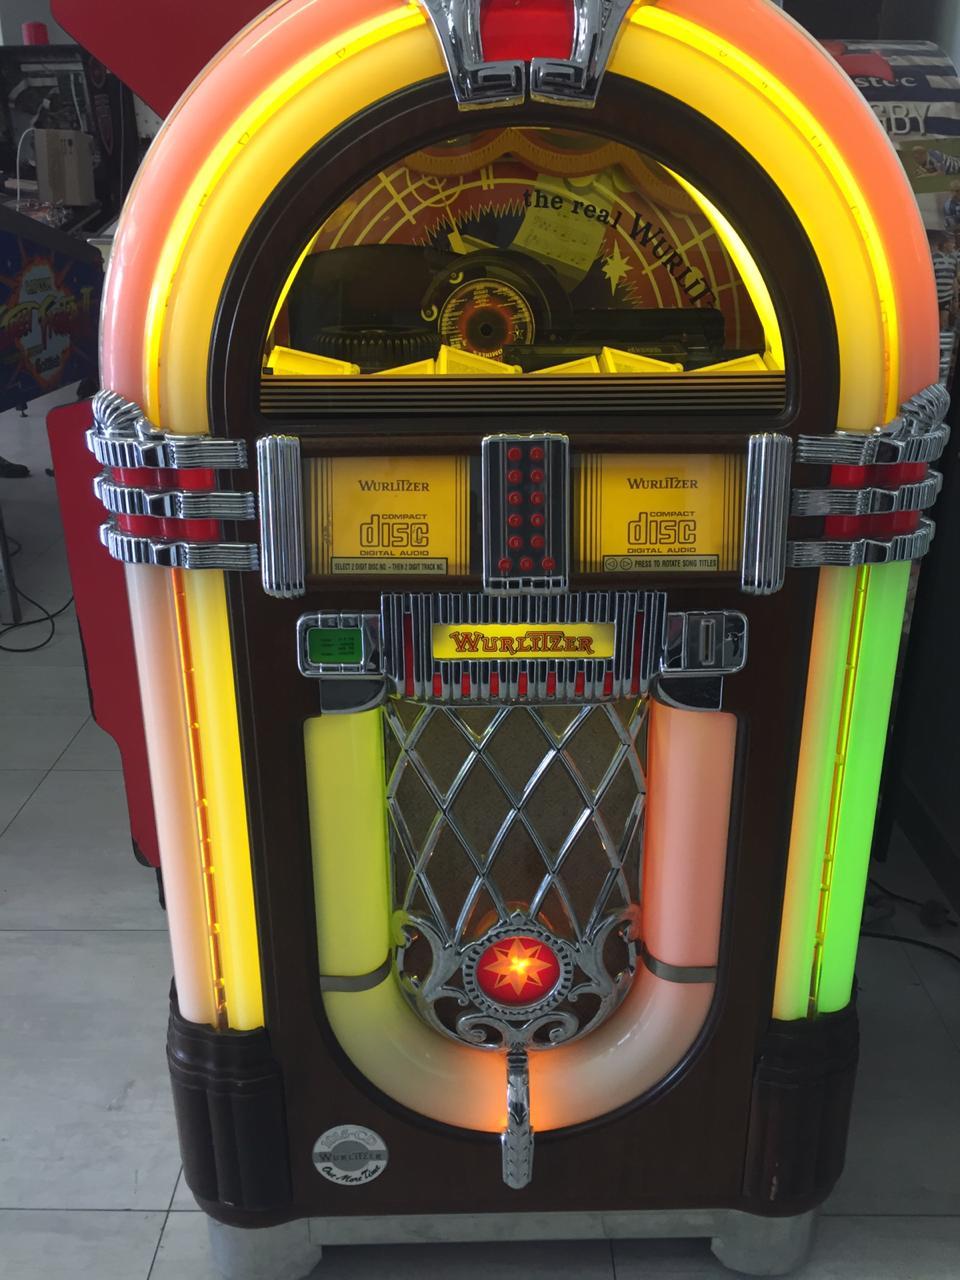 Wurlitzer Model 1015 CD Jukebox Walnut Model for sale in perfect condition  | Junk Mail